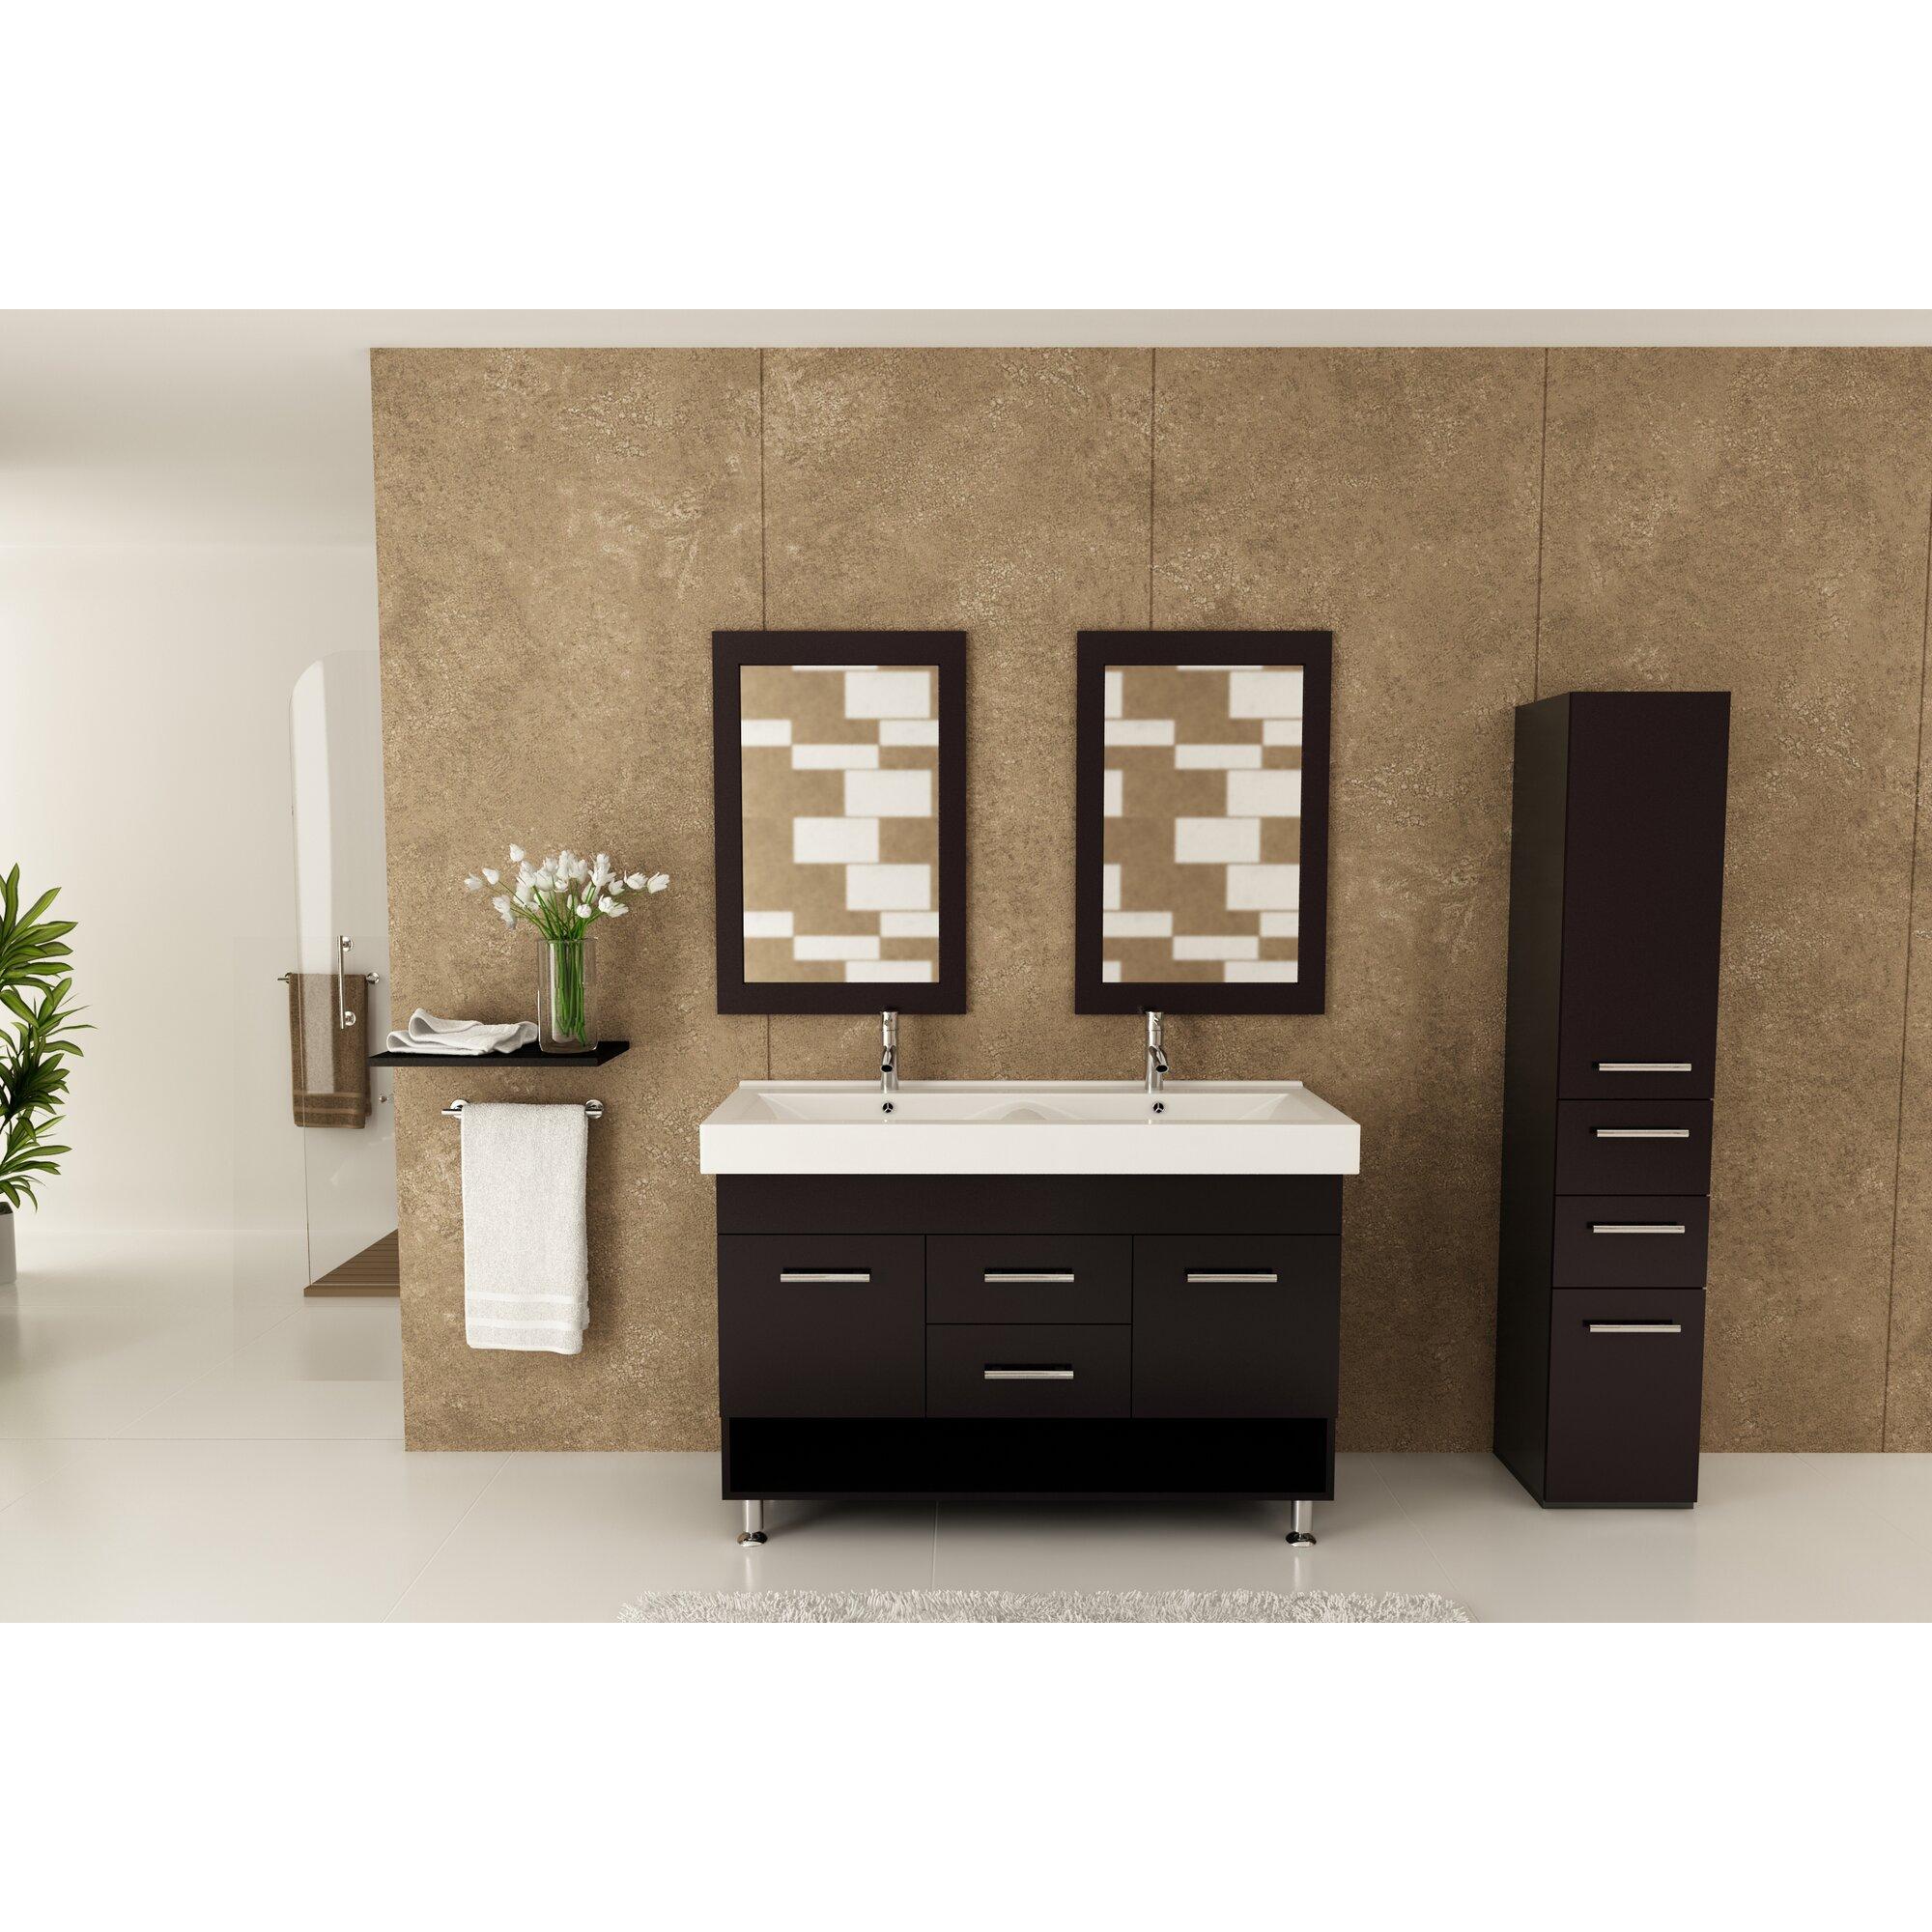 jwh living rigel 48 quot  double bathroom vanity set   reviews 48 Double Sink Bathroom Vanity 48 Inch Double Bathroom Vanity